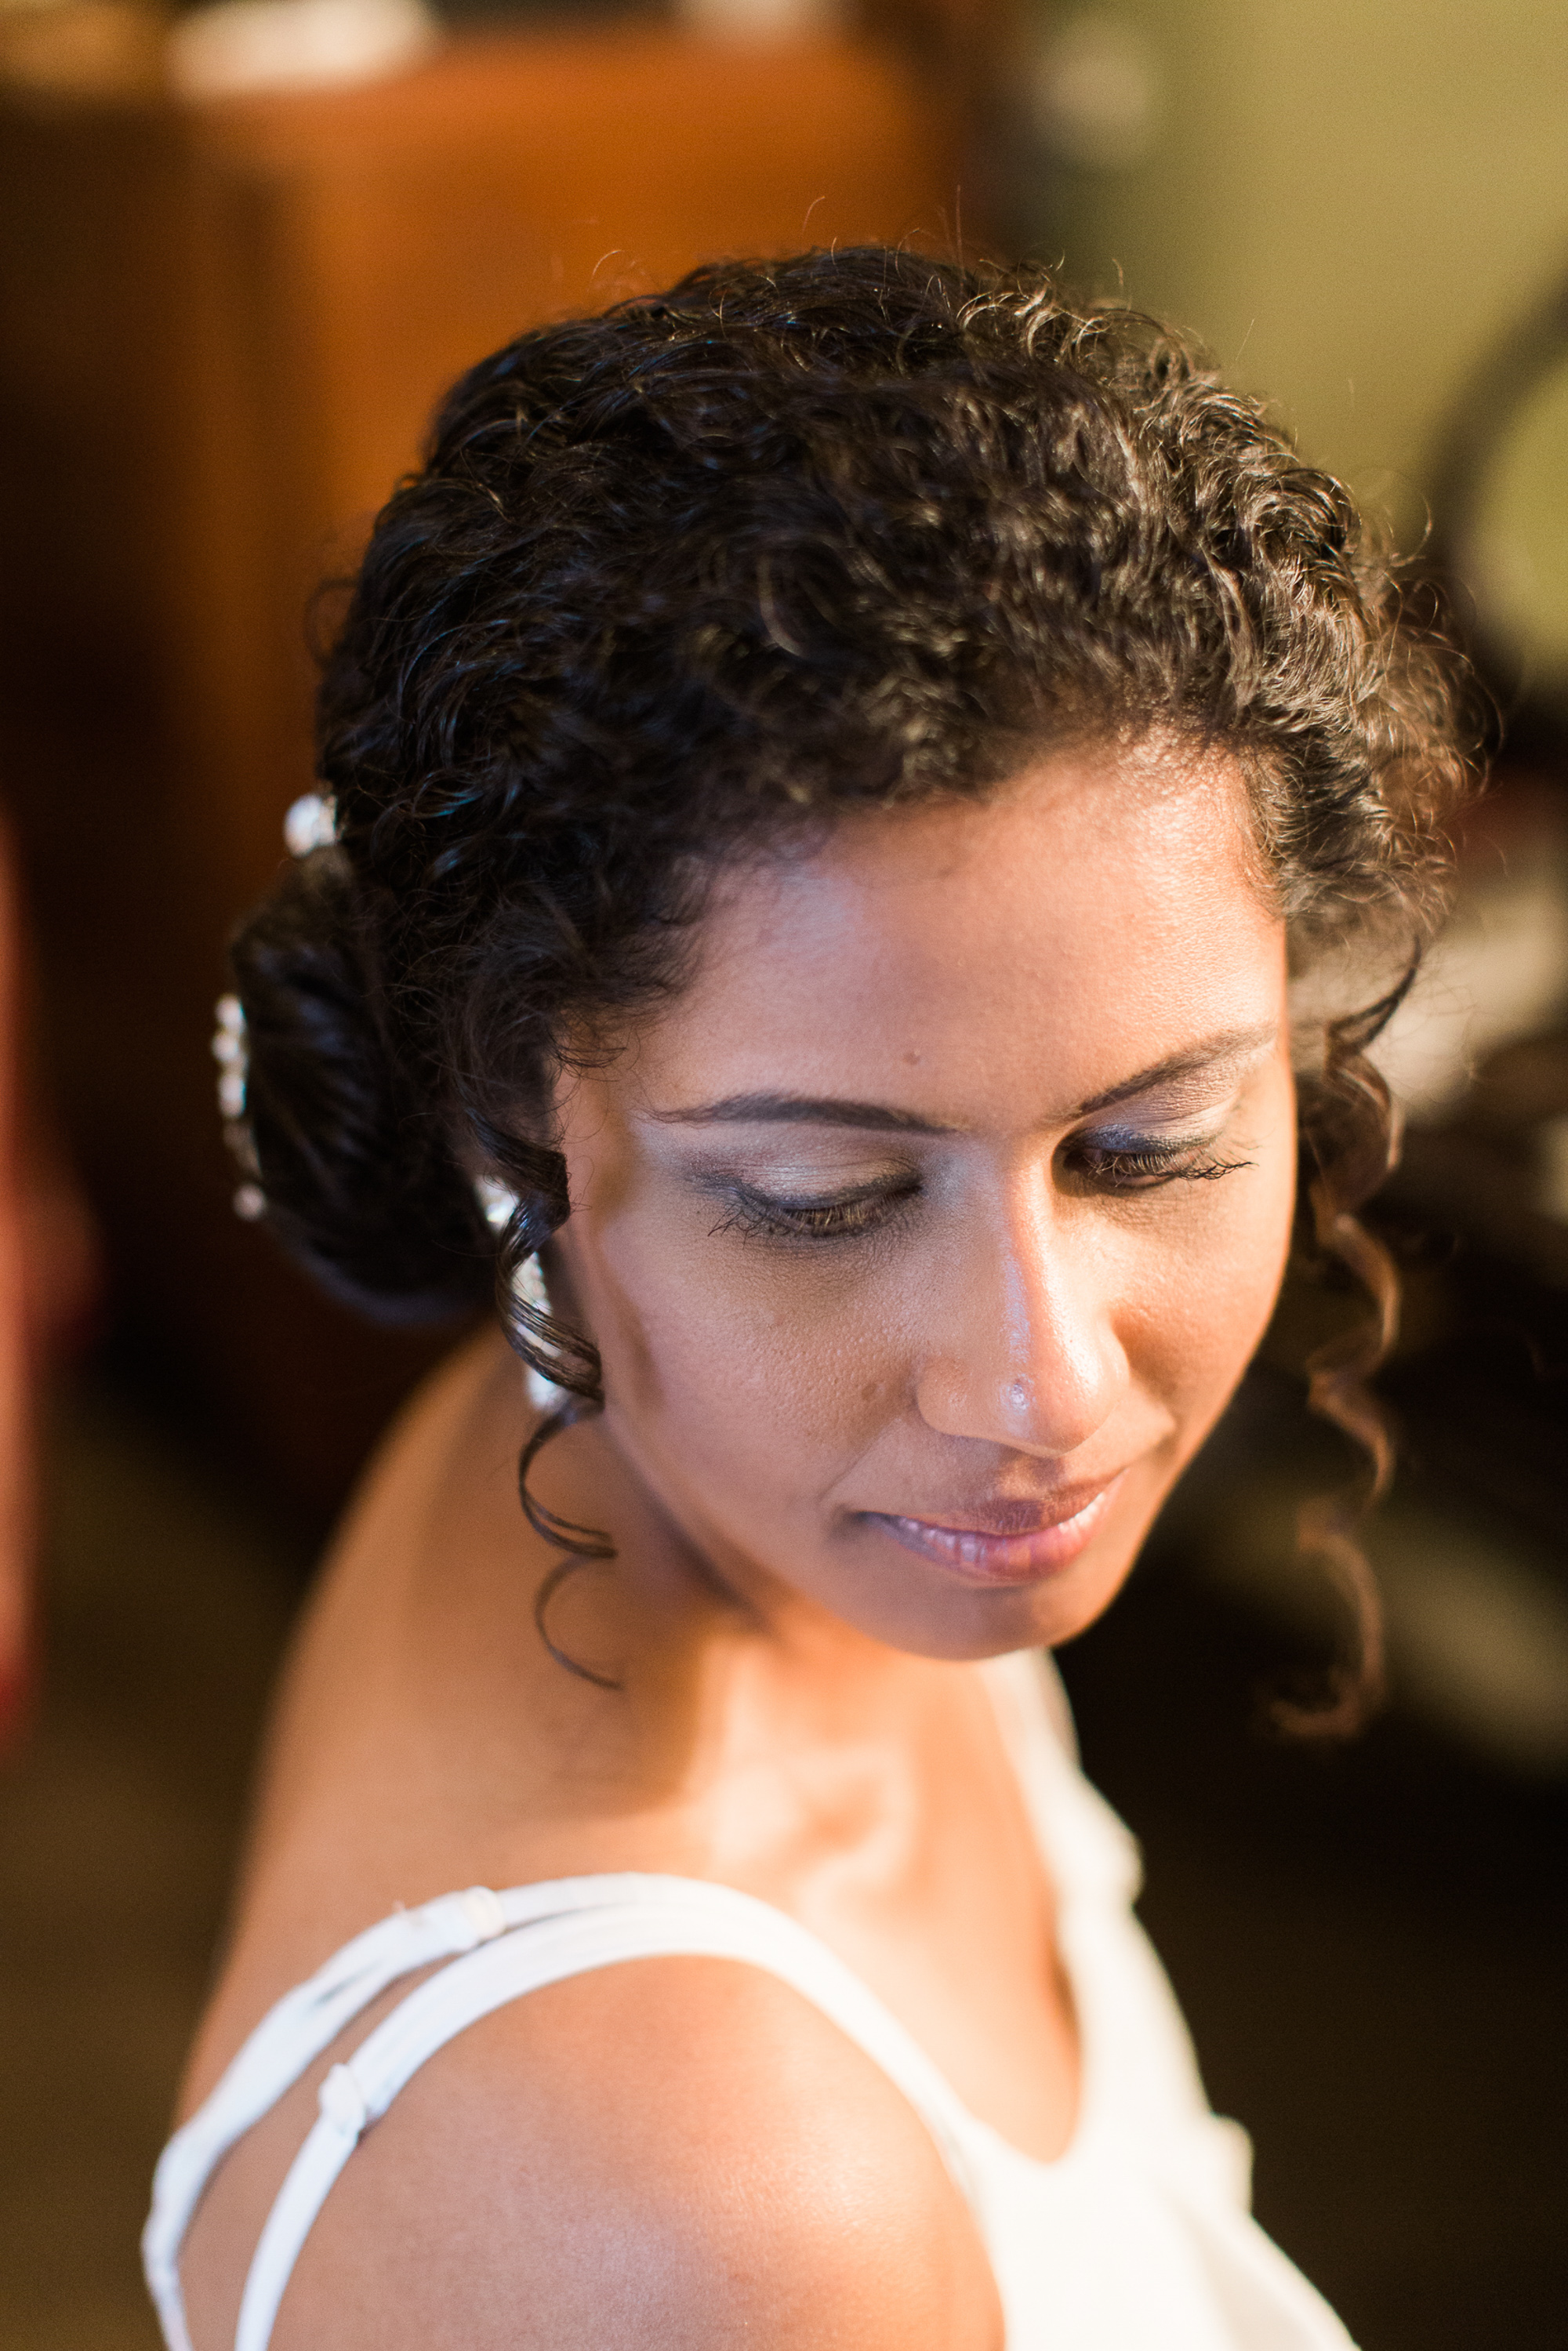 f331a-messina-hof-wedding-8messina-hof-wedding-8.jpg